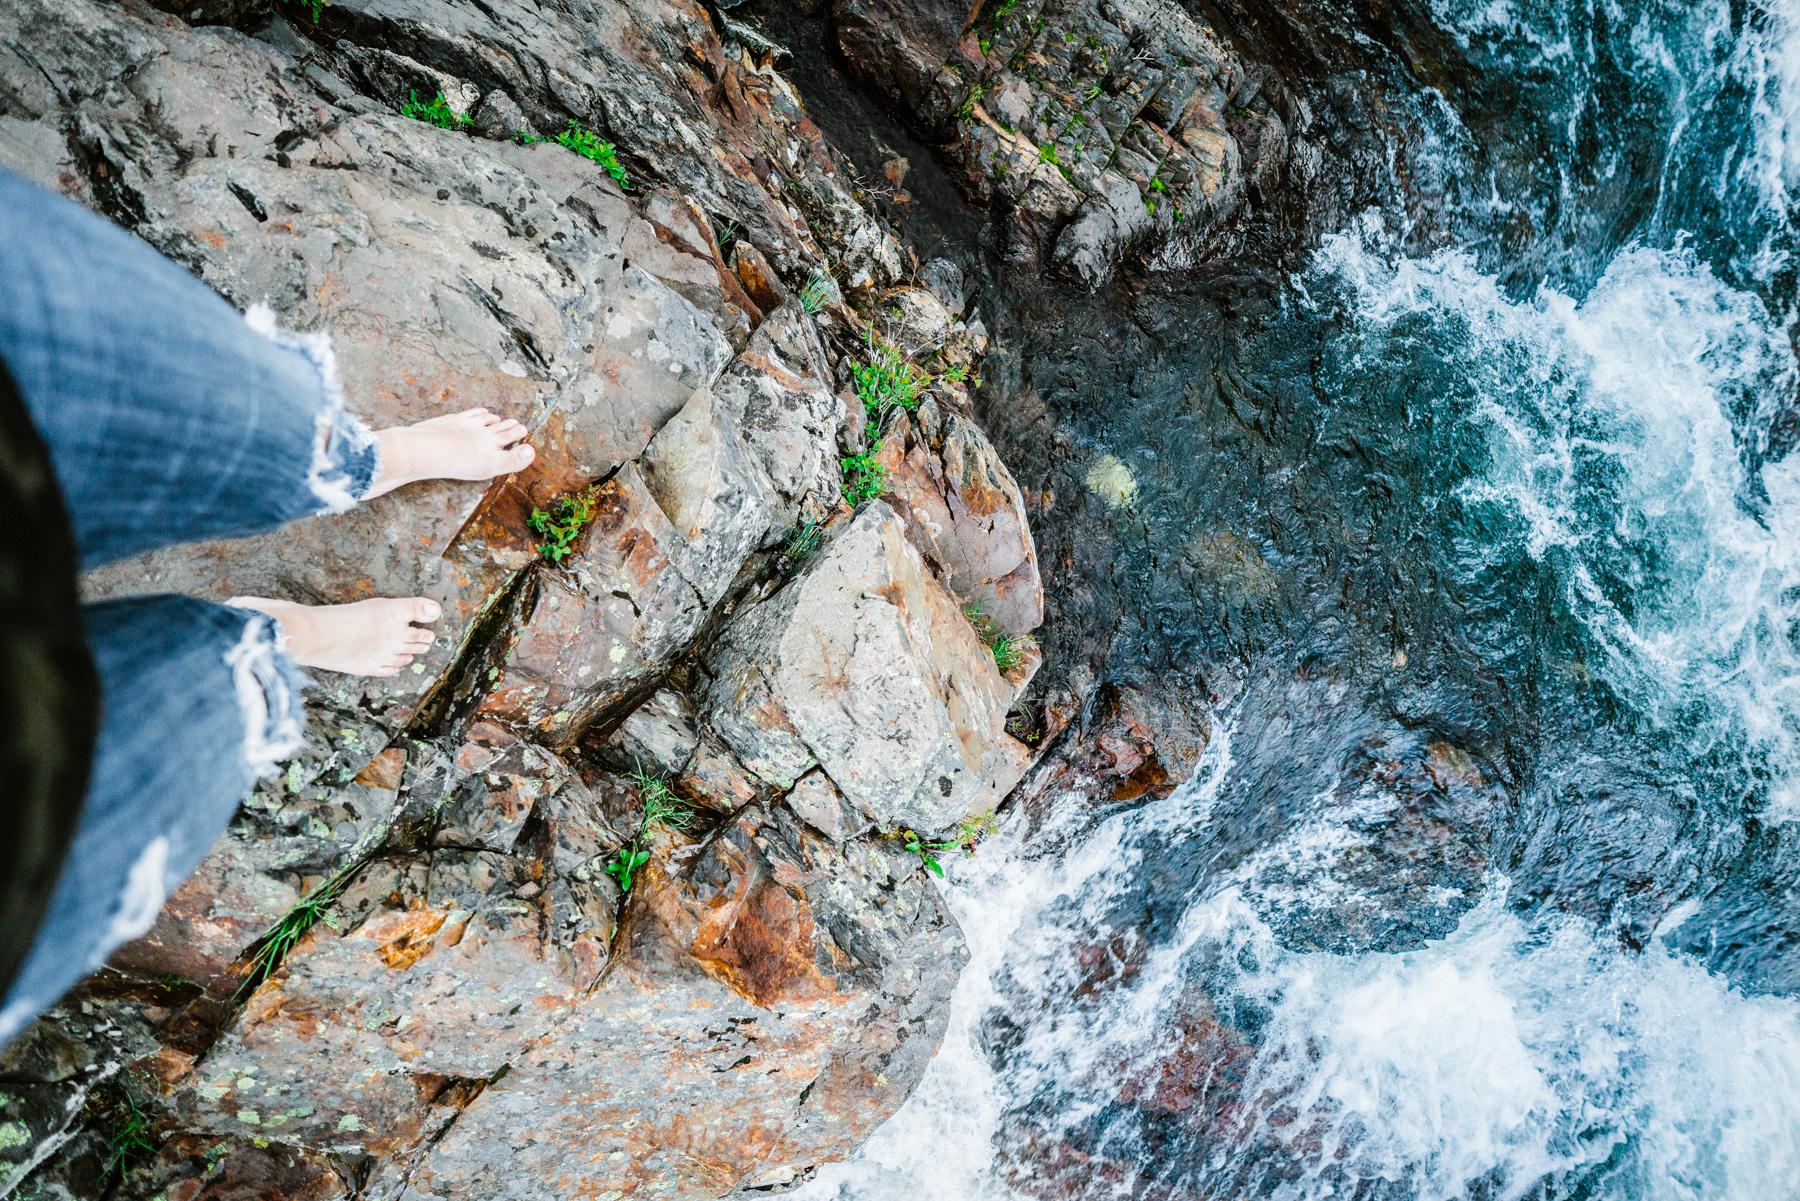 How to Photograph Wafterfalls - Glenn Alpine Waterfall South Lake Tahoe